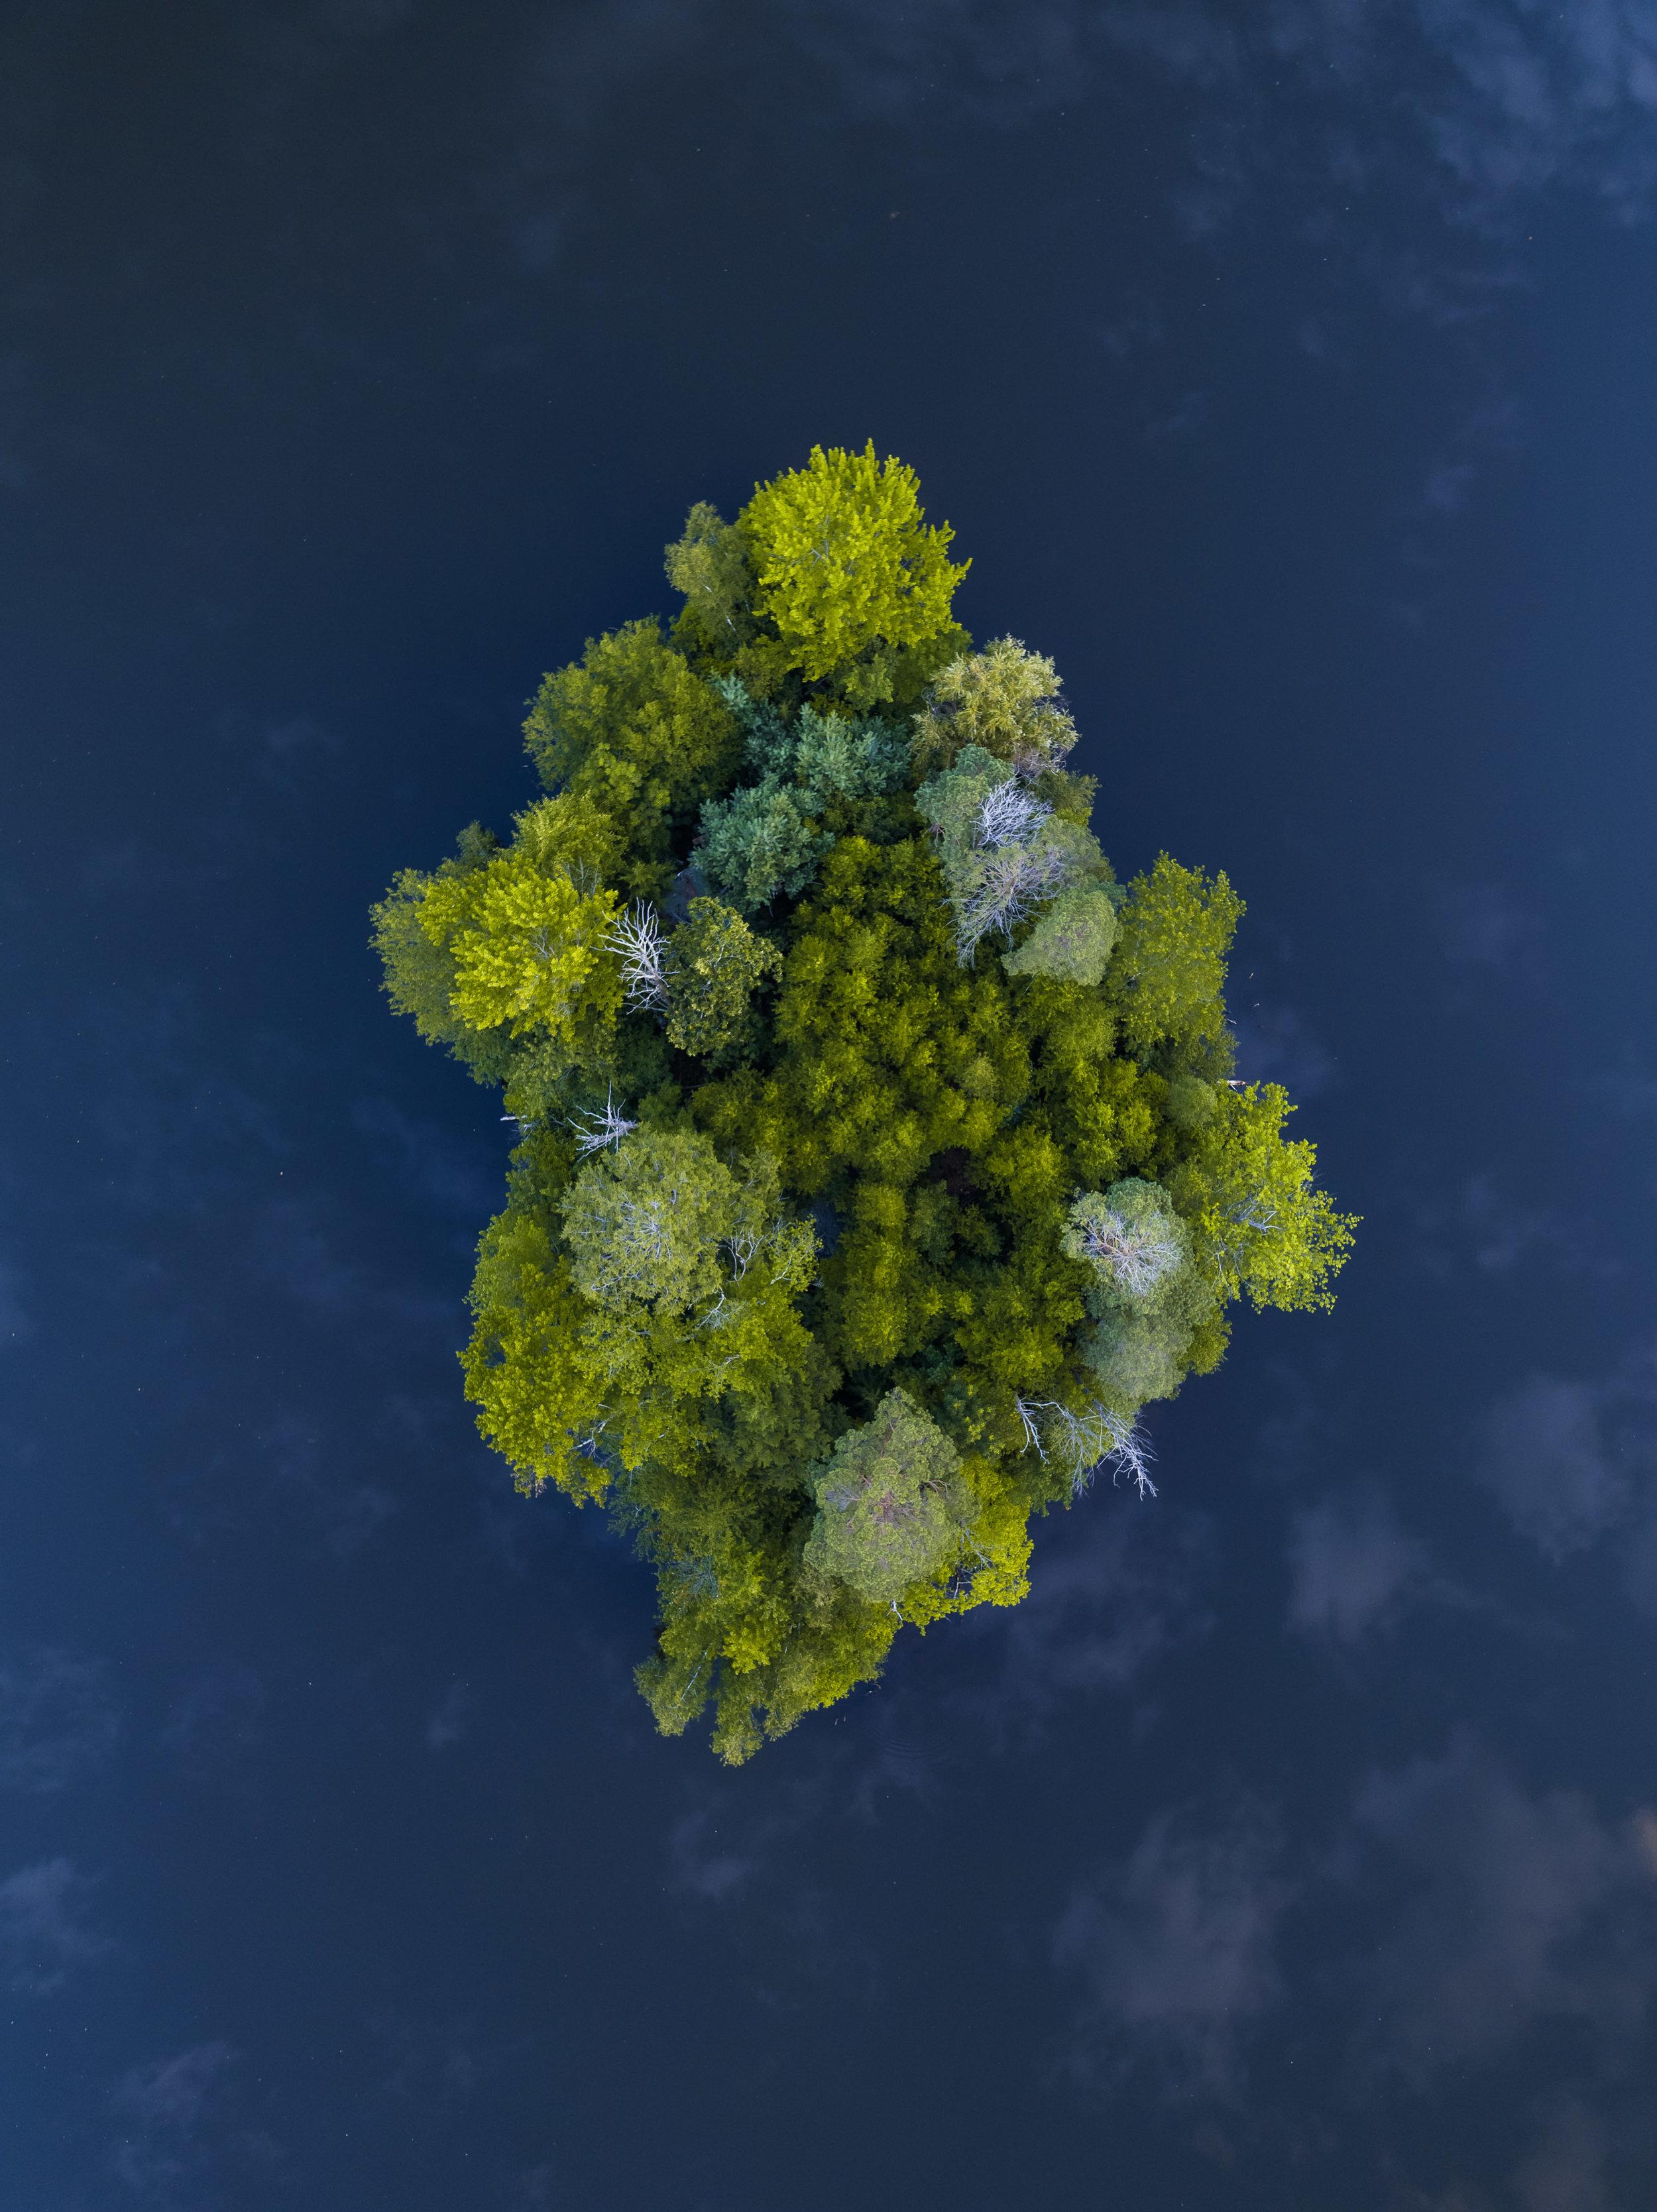 harrisonisland_typoland_aerial-1 copy.jpg